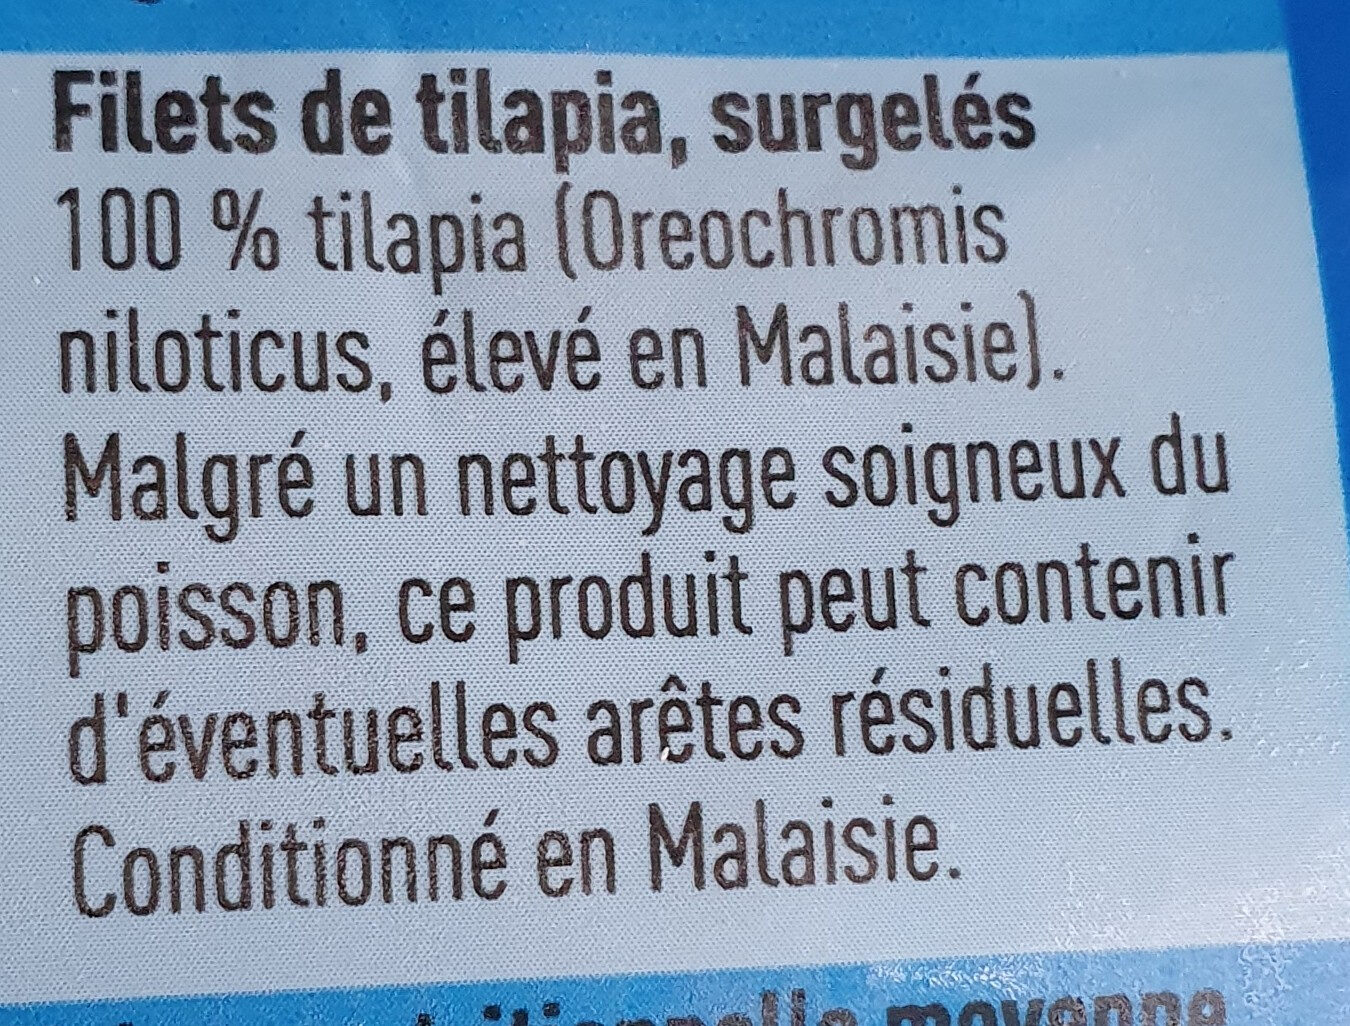 Filets de tilapia boni - Ingrediënten